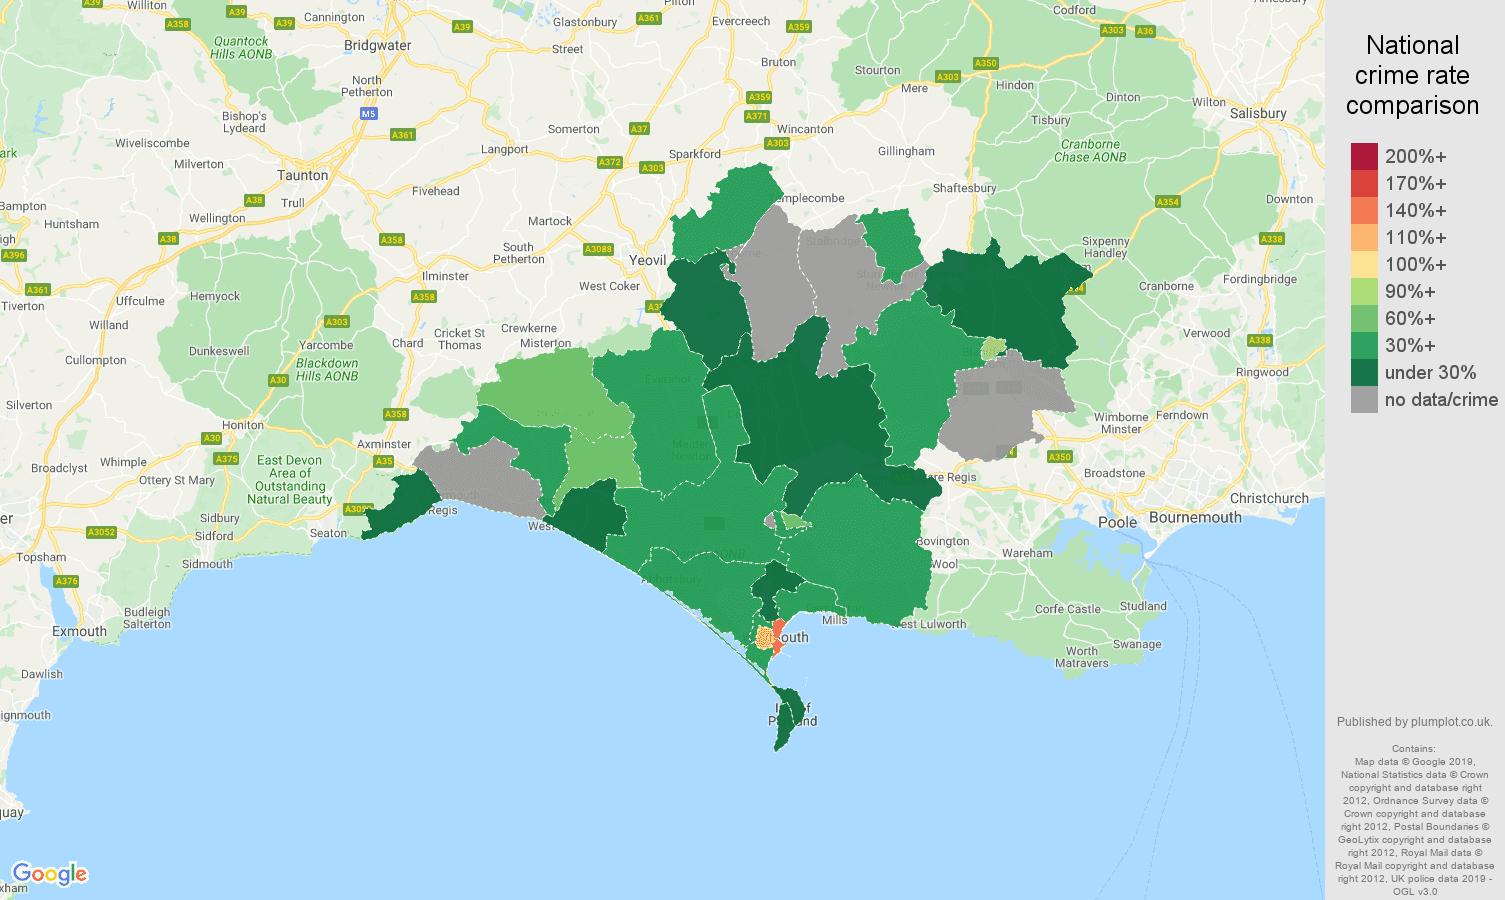 Dorchester possession of weapons crime rate comparison map